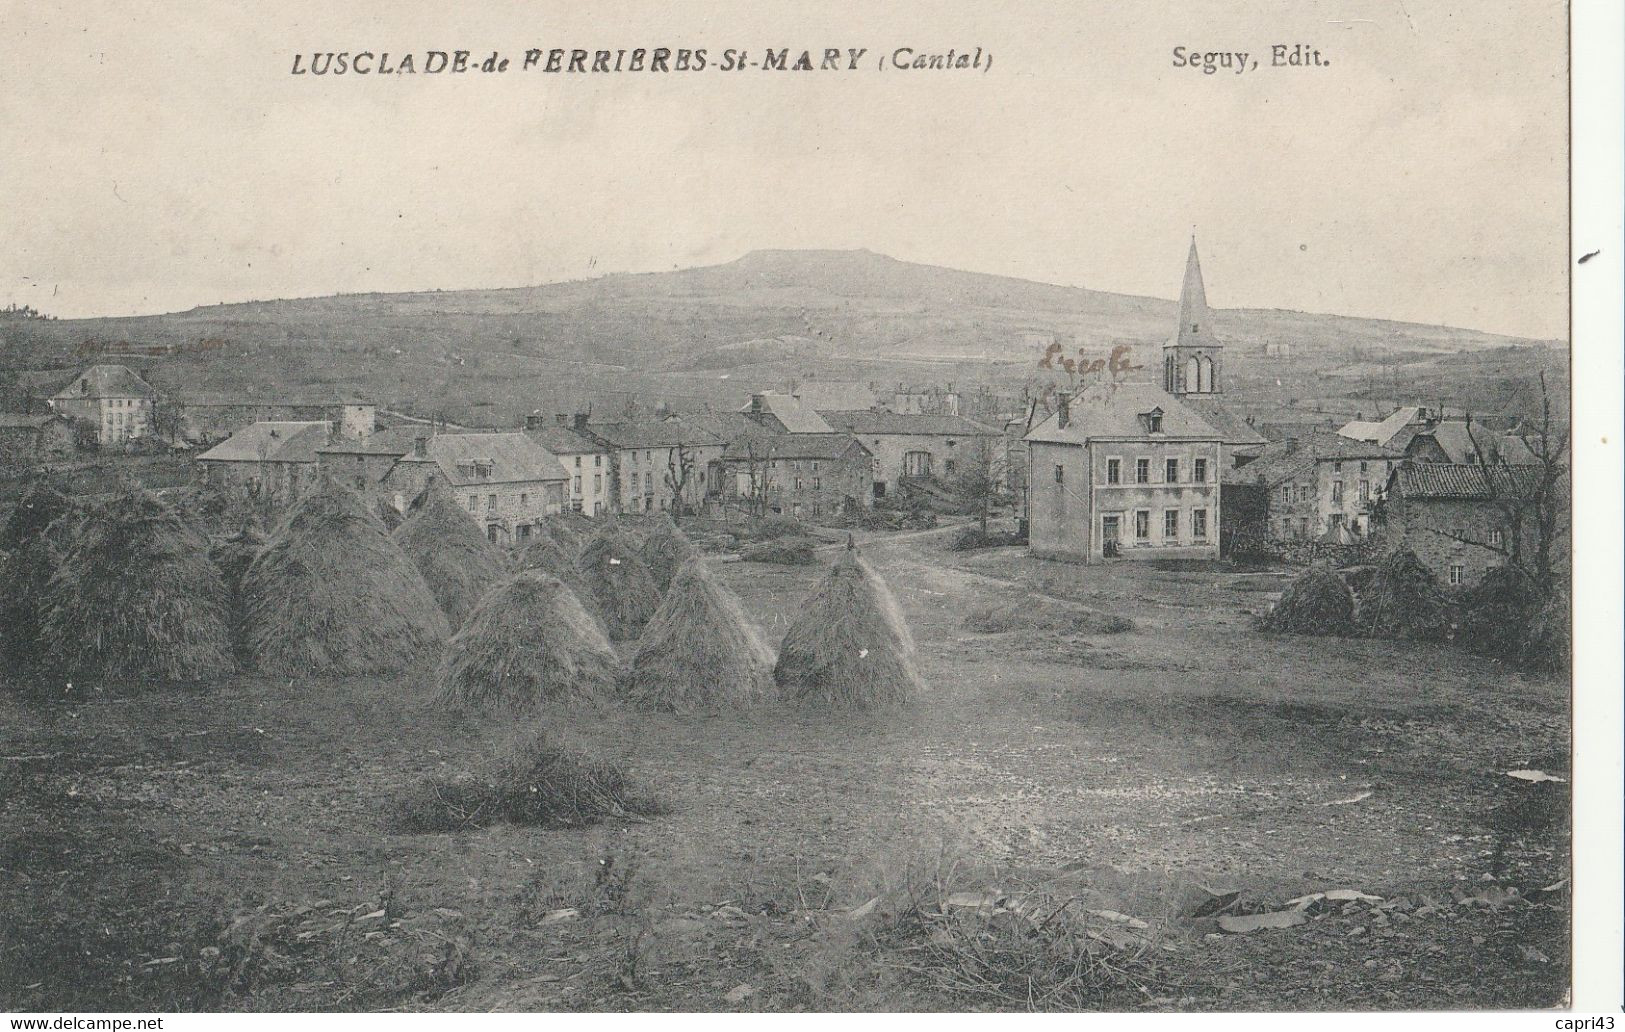 15 VILLAGE DE LUSCLADE Cne De FERRIERES ST MARIE - Other Municipalities